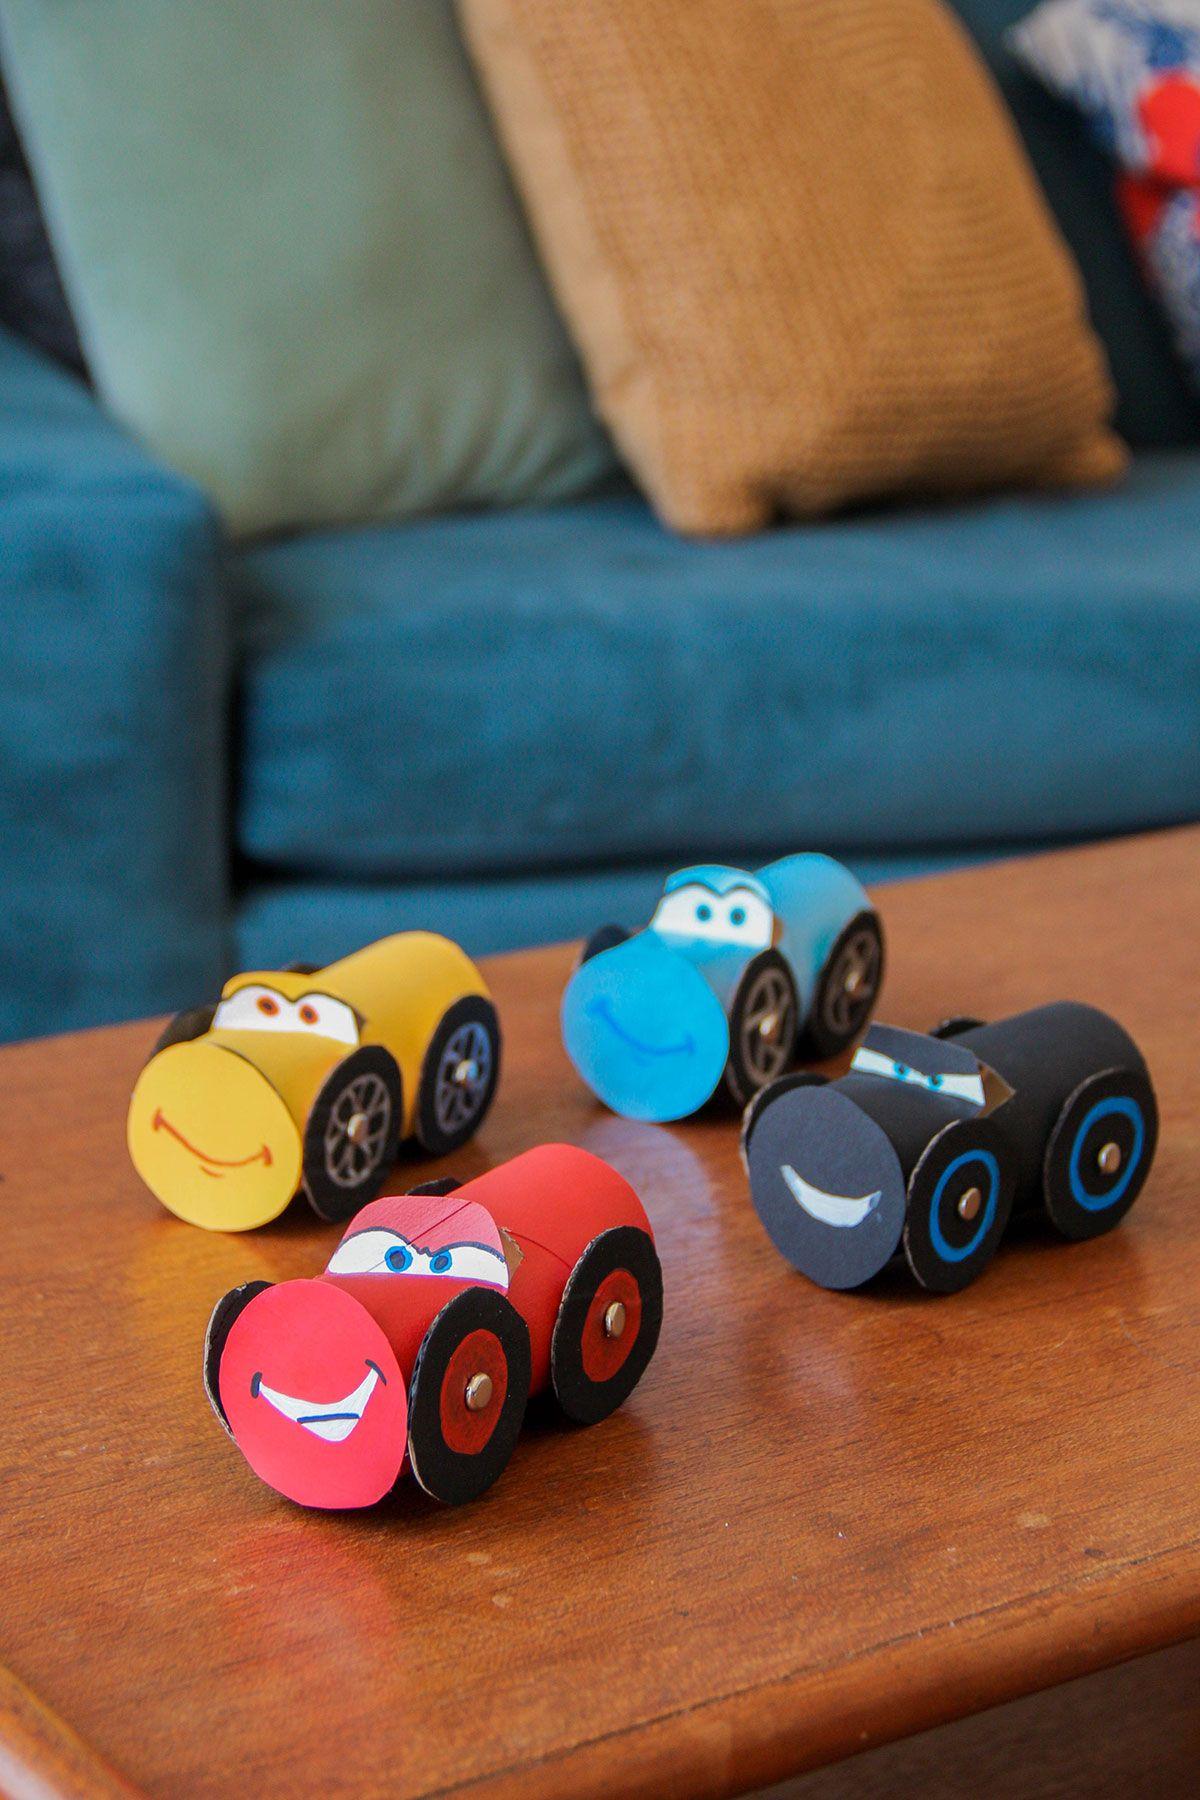 Car 3 toys  Cars  Cardboard Craft For This DisneyWeekend  crafts  Pinterest